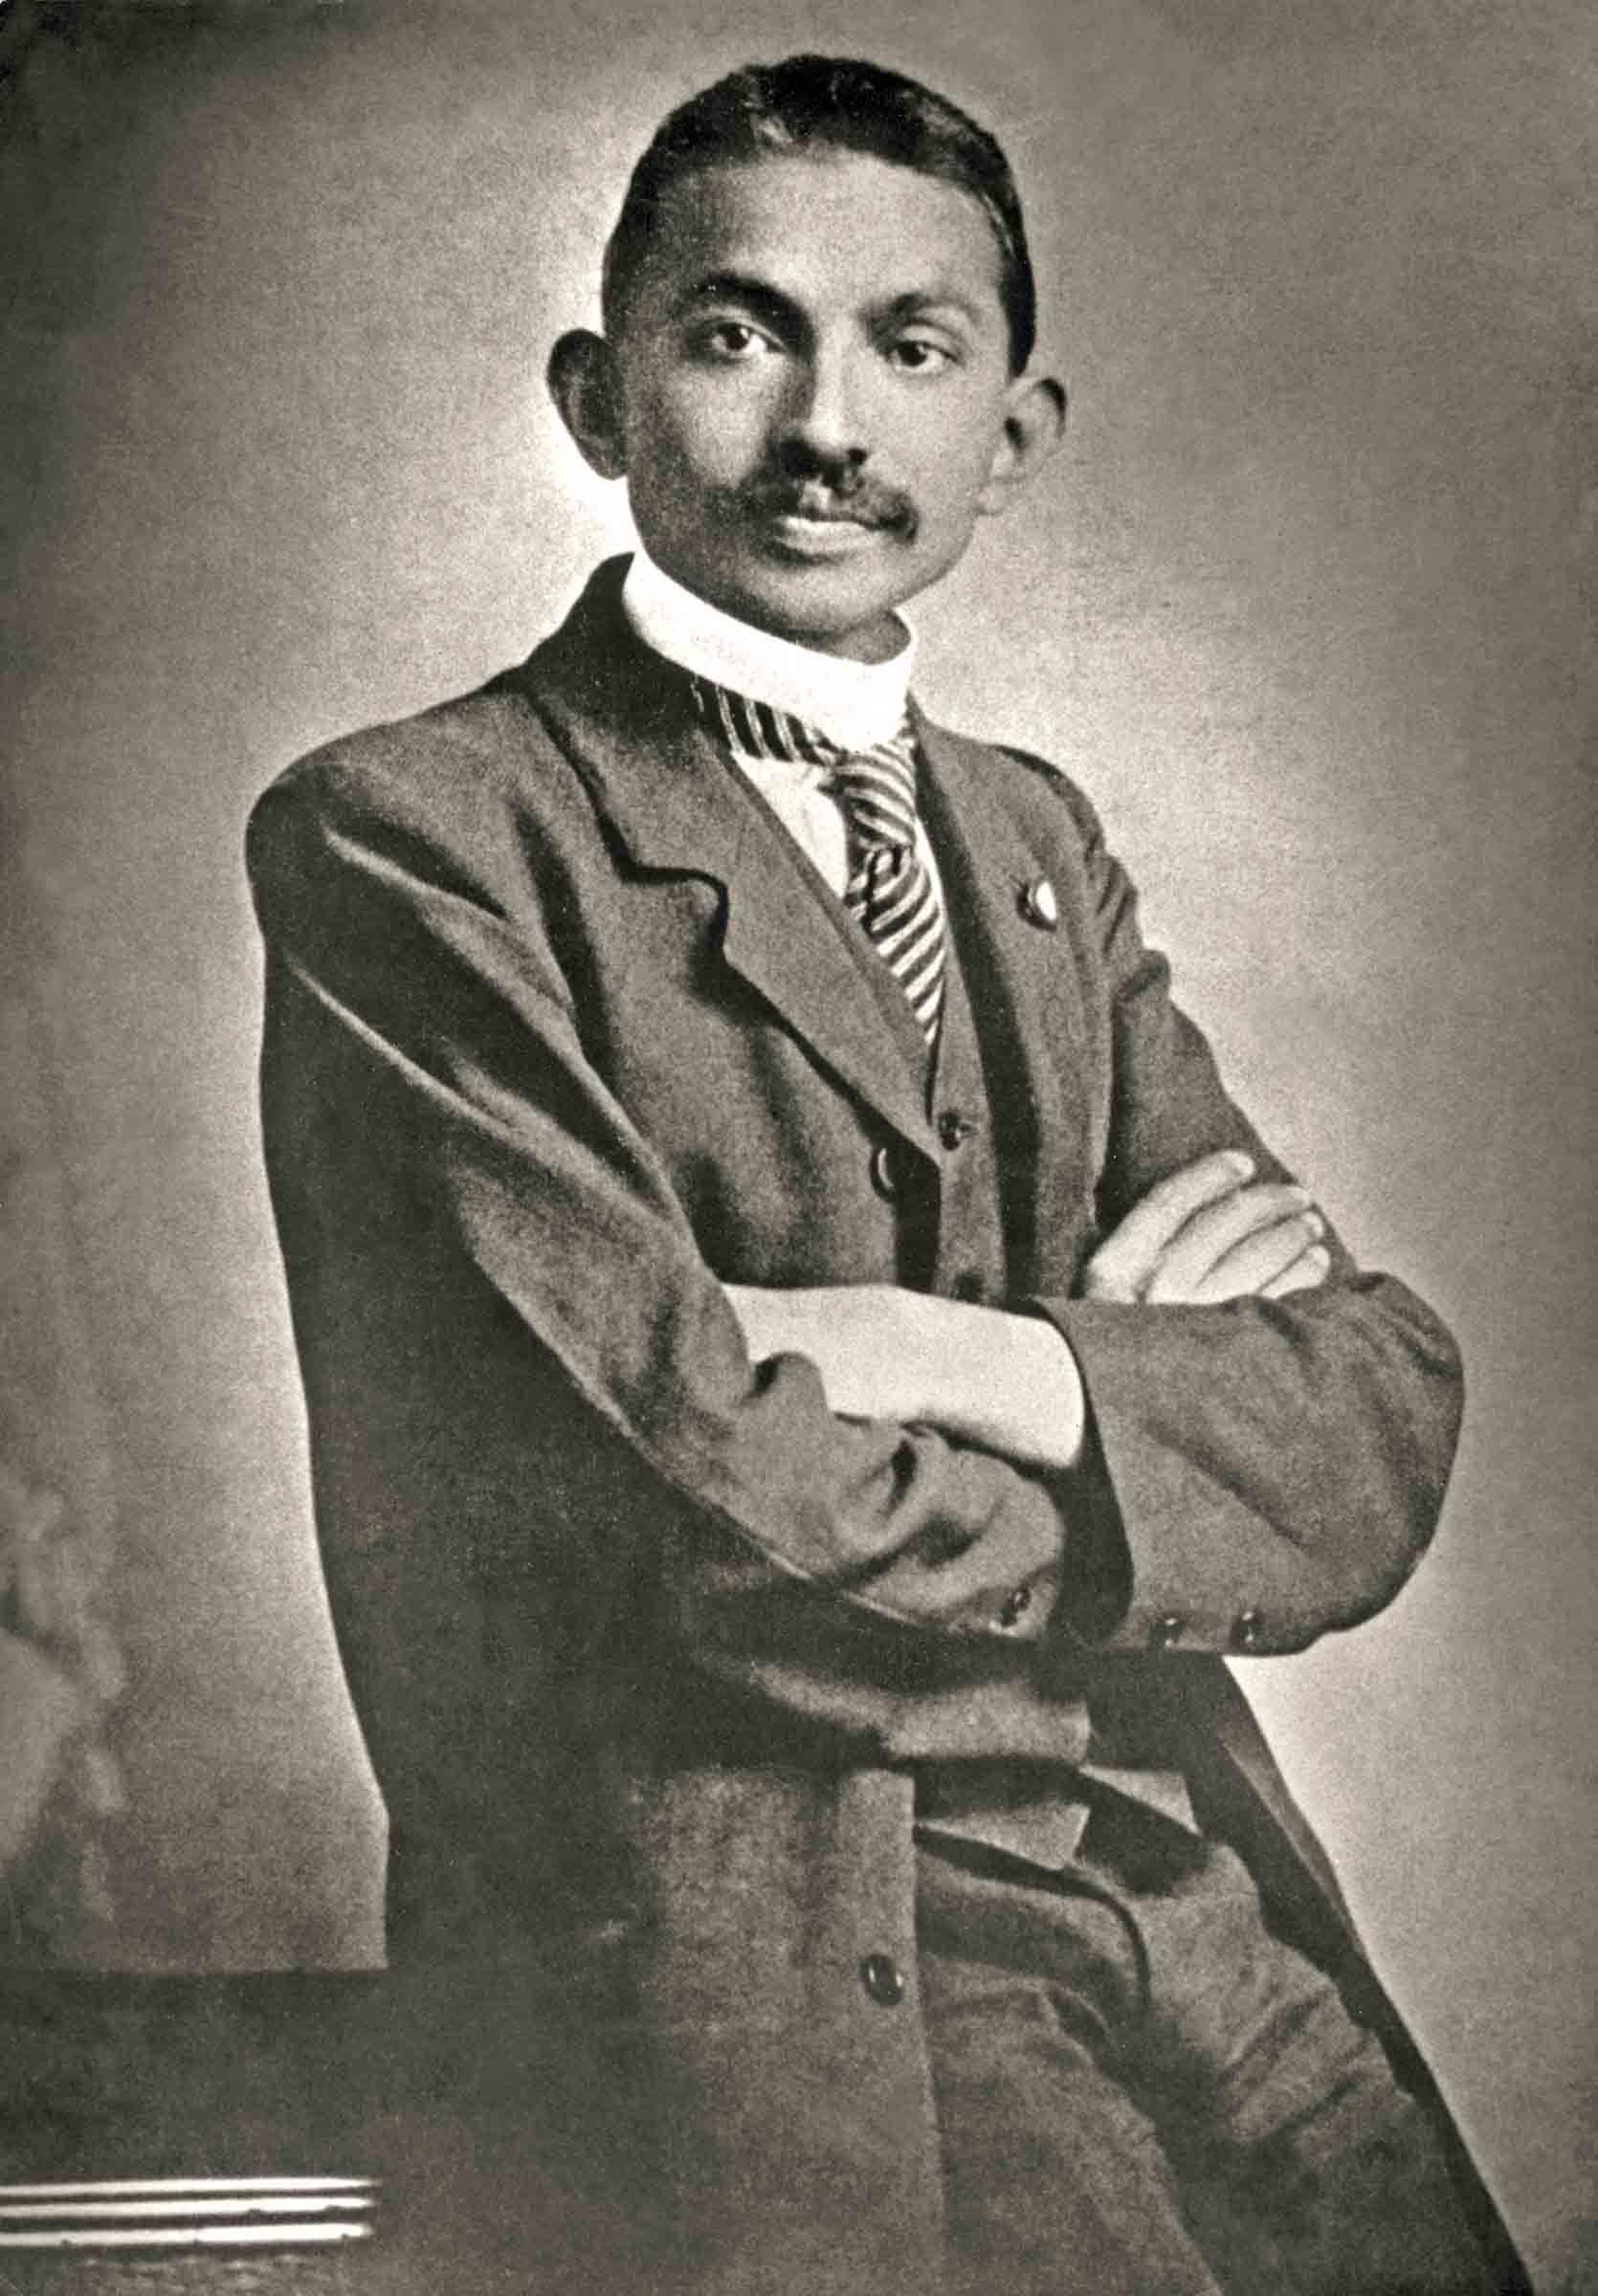 Mahatma Gandhi, African History, Gandhi Racist, India Racism, KOLUMN Magazine, KOLUMN, KINDR'D Magazine, KINDR'D, Willoughby Avenue